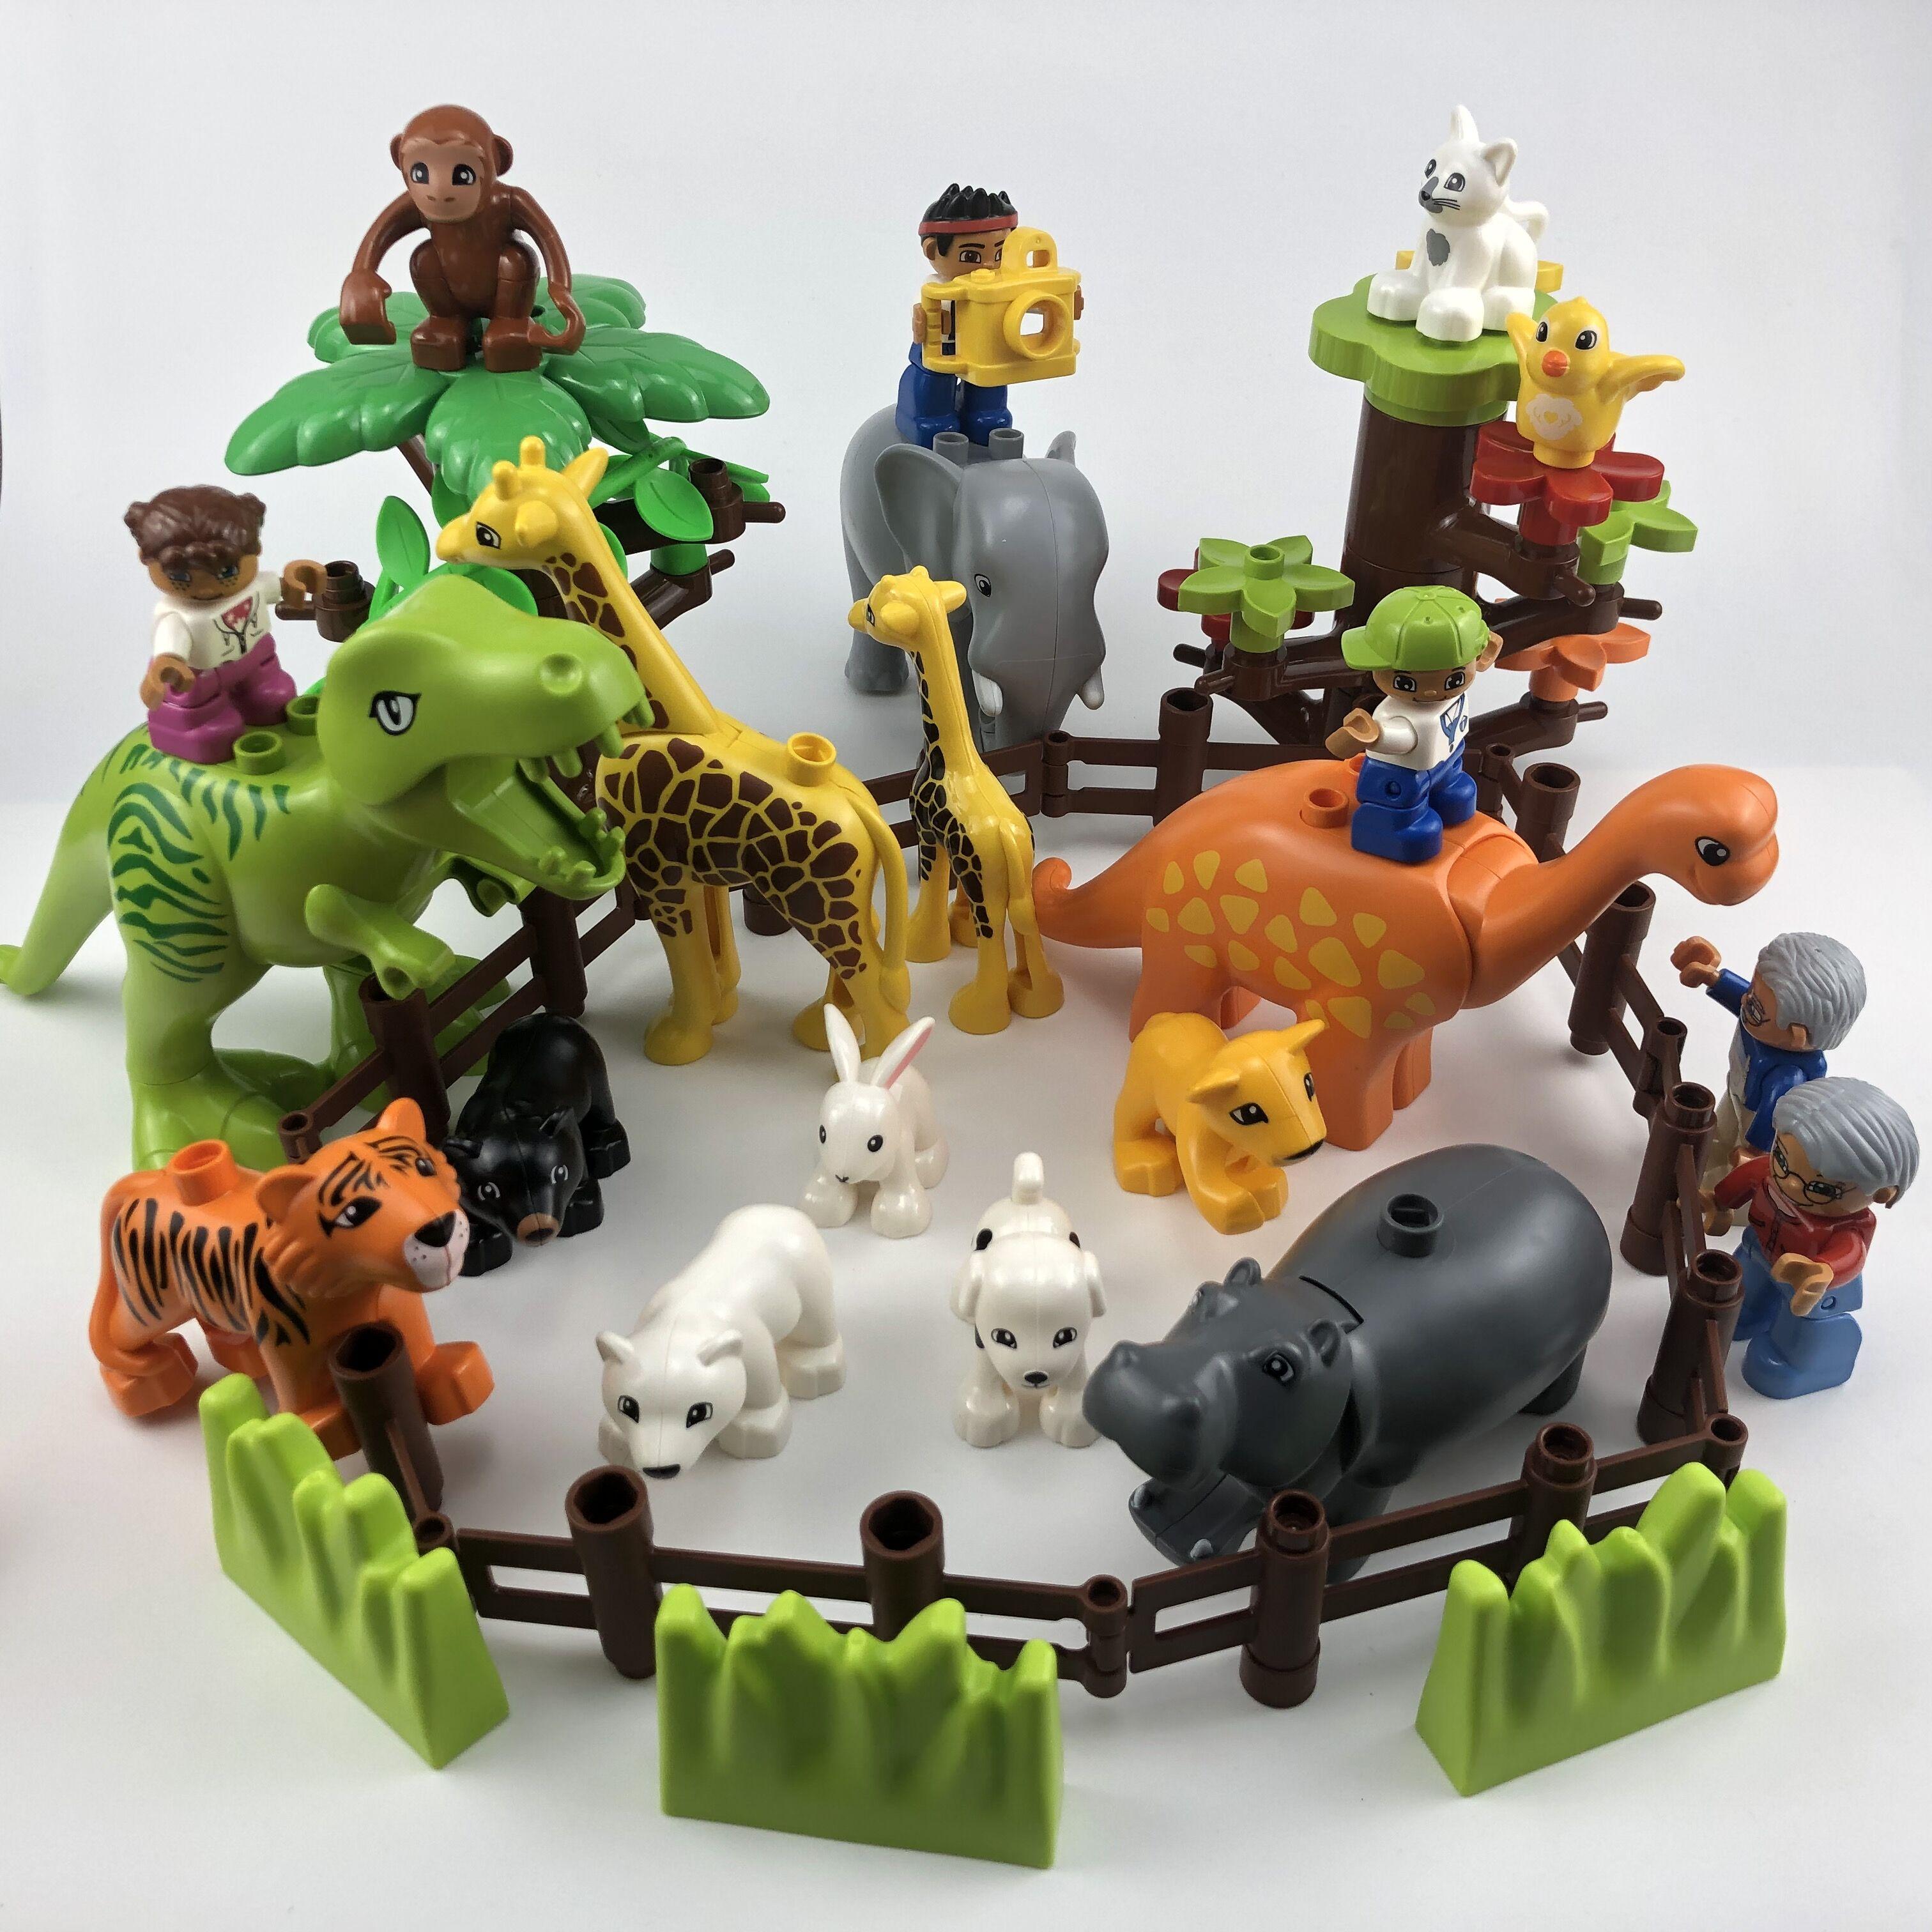 Legoing Duplo Animals Zoo Sheep Monkey Dog Beer Rabbit Bird Building Blocks Toys For Children Compatible Duplo Legoing Figures